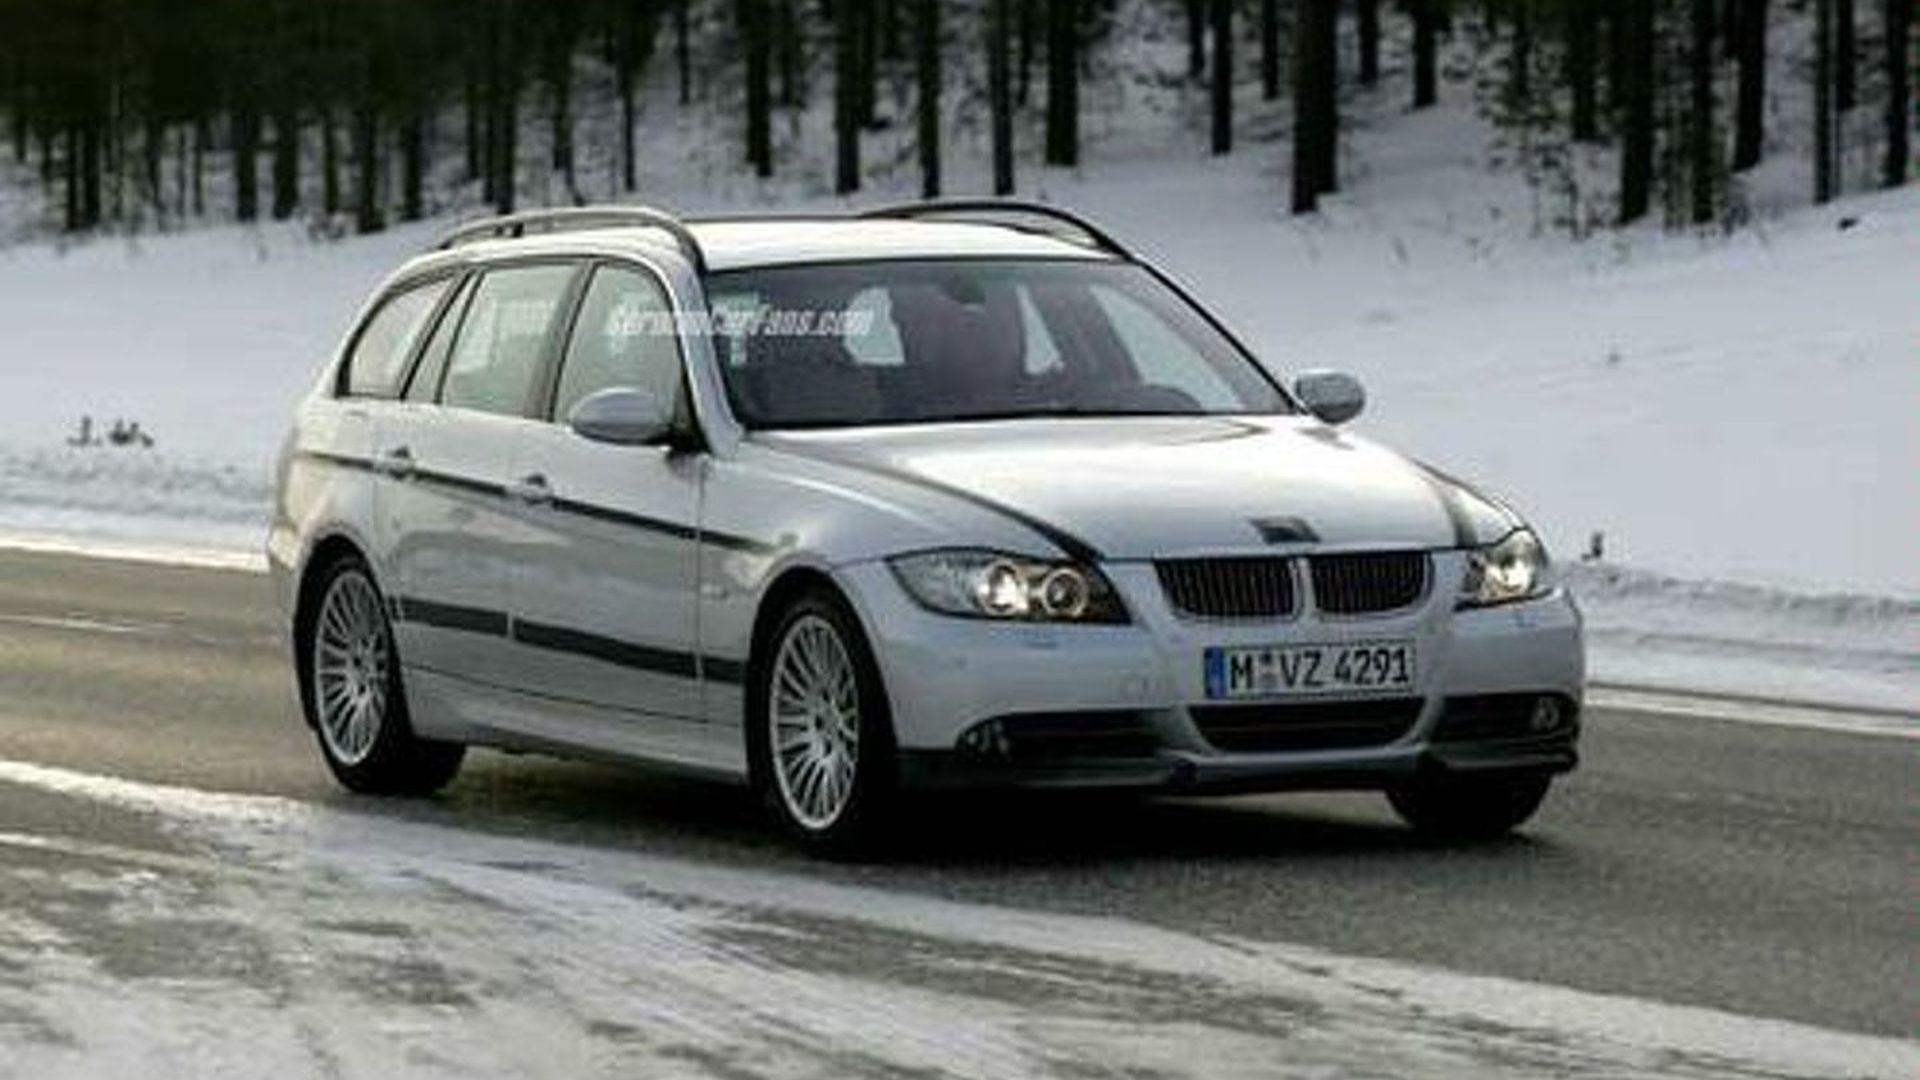 Spy Photos of BMW 3 Series Model Range